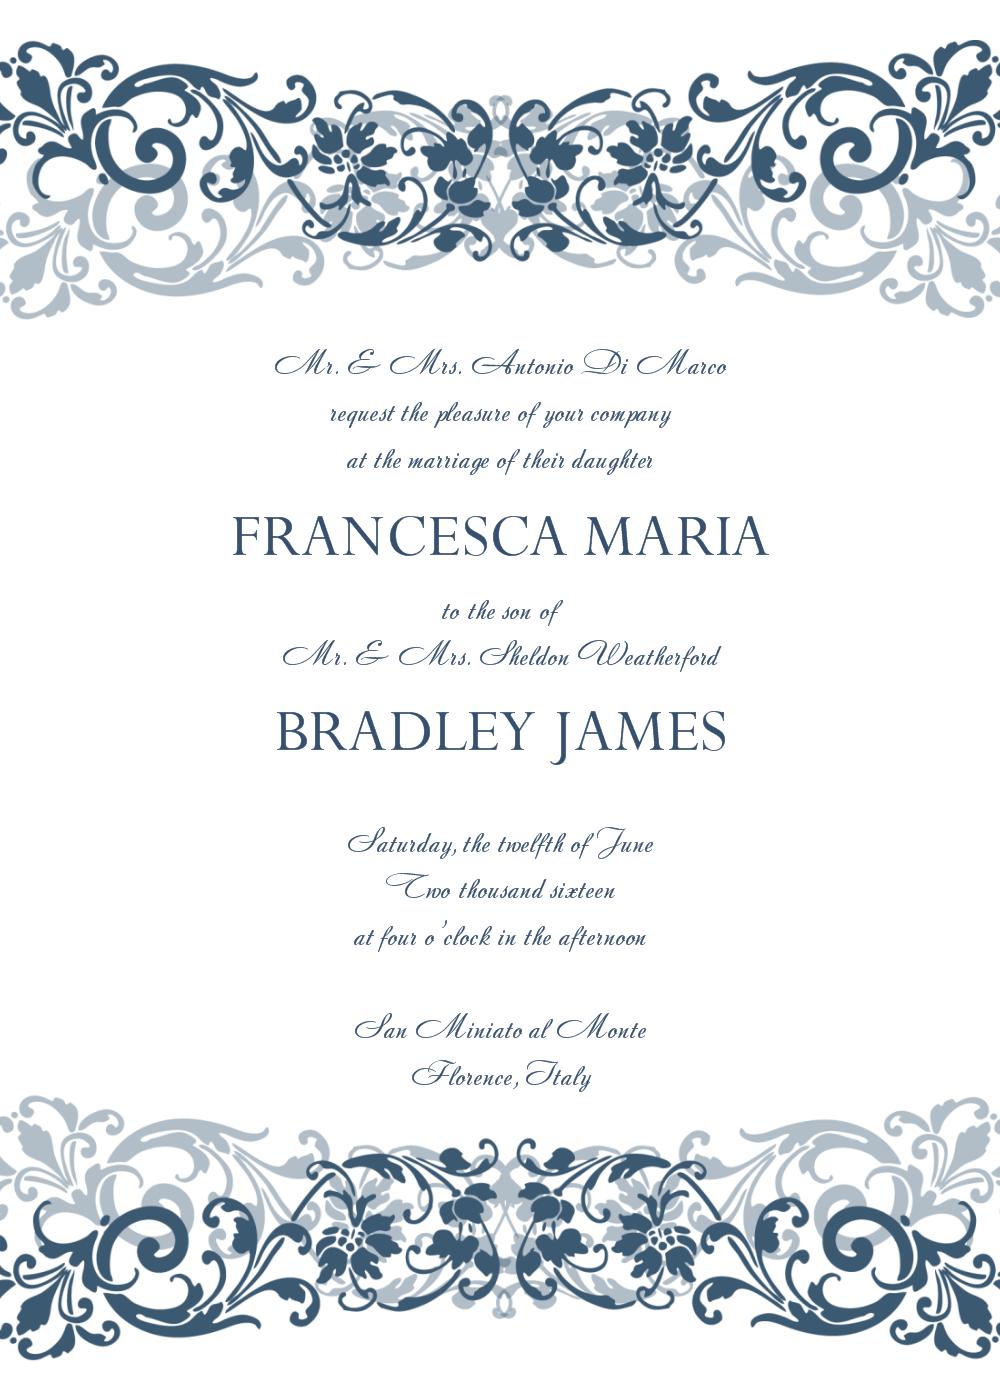 Free Wedding Invitation Templates For Word   Wedding Invitation - Free Printable Wedding Invitation Templates For Word